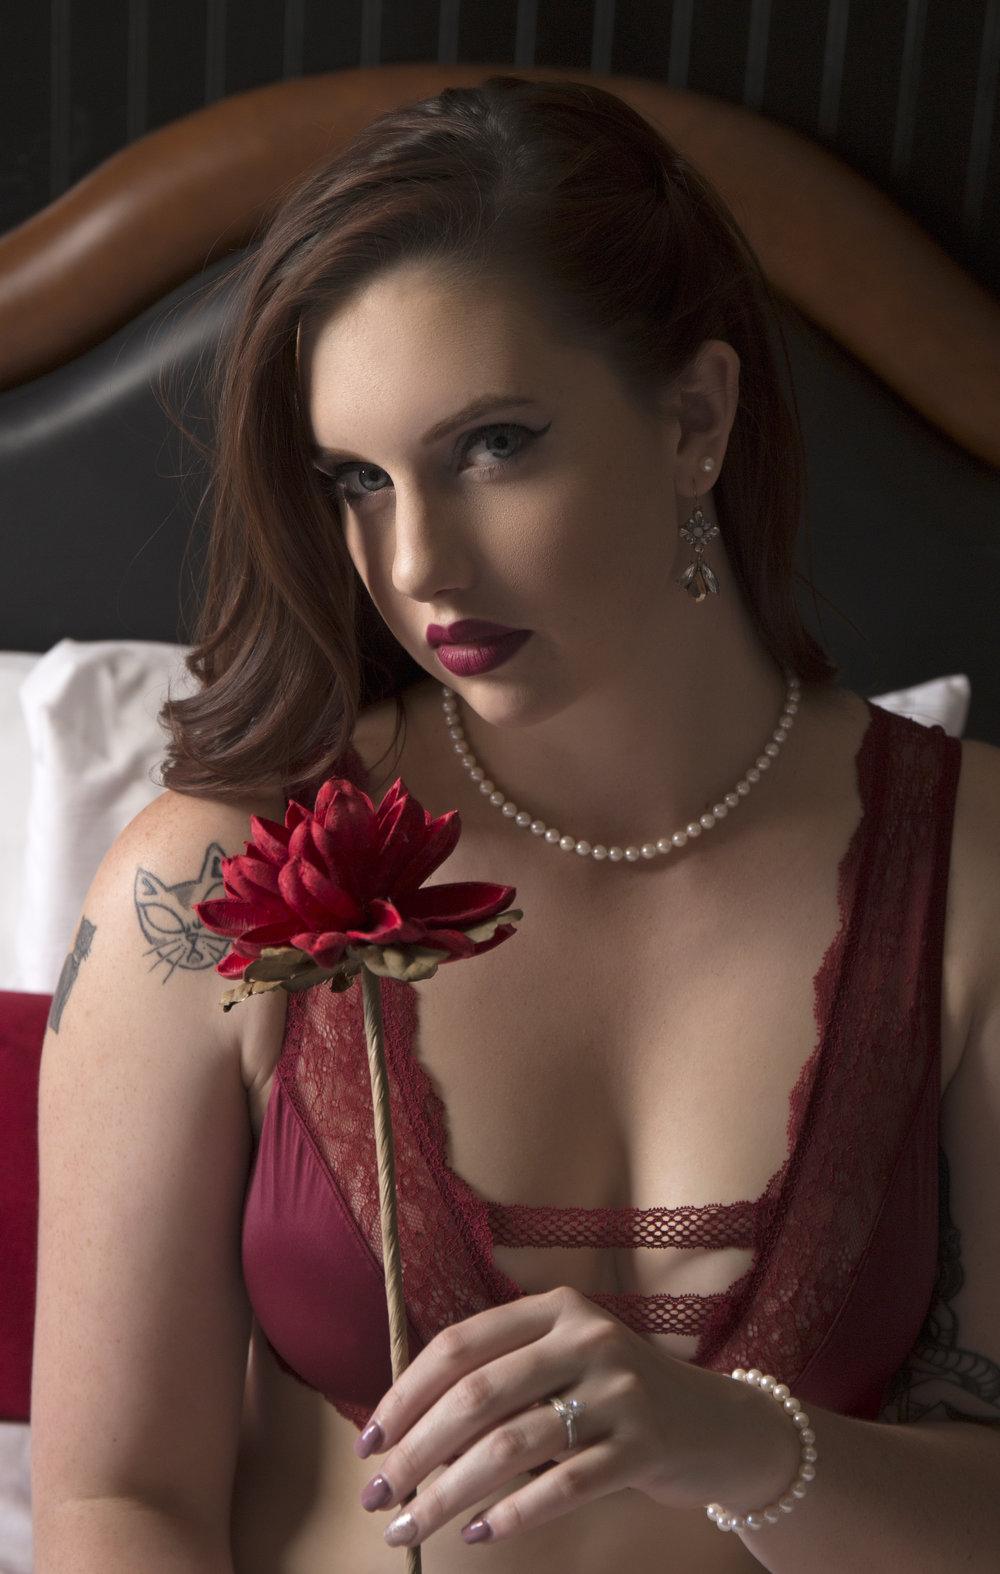 las_vegas_boudoir_photography_casey_jade_Artisan_Hotel_rose